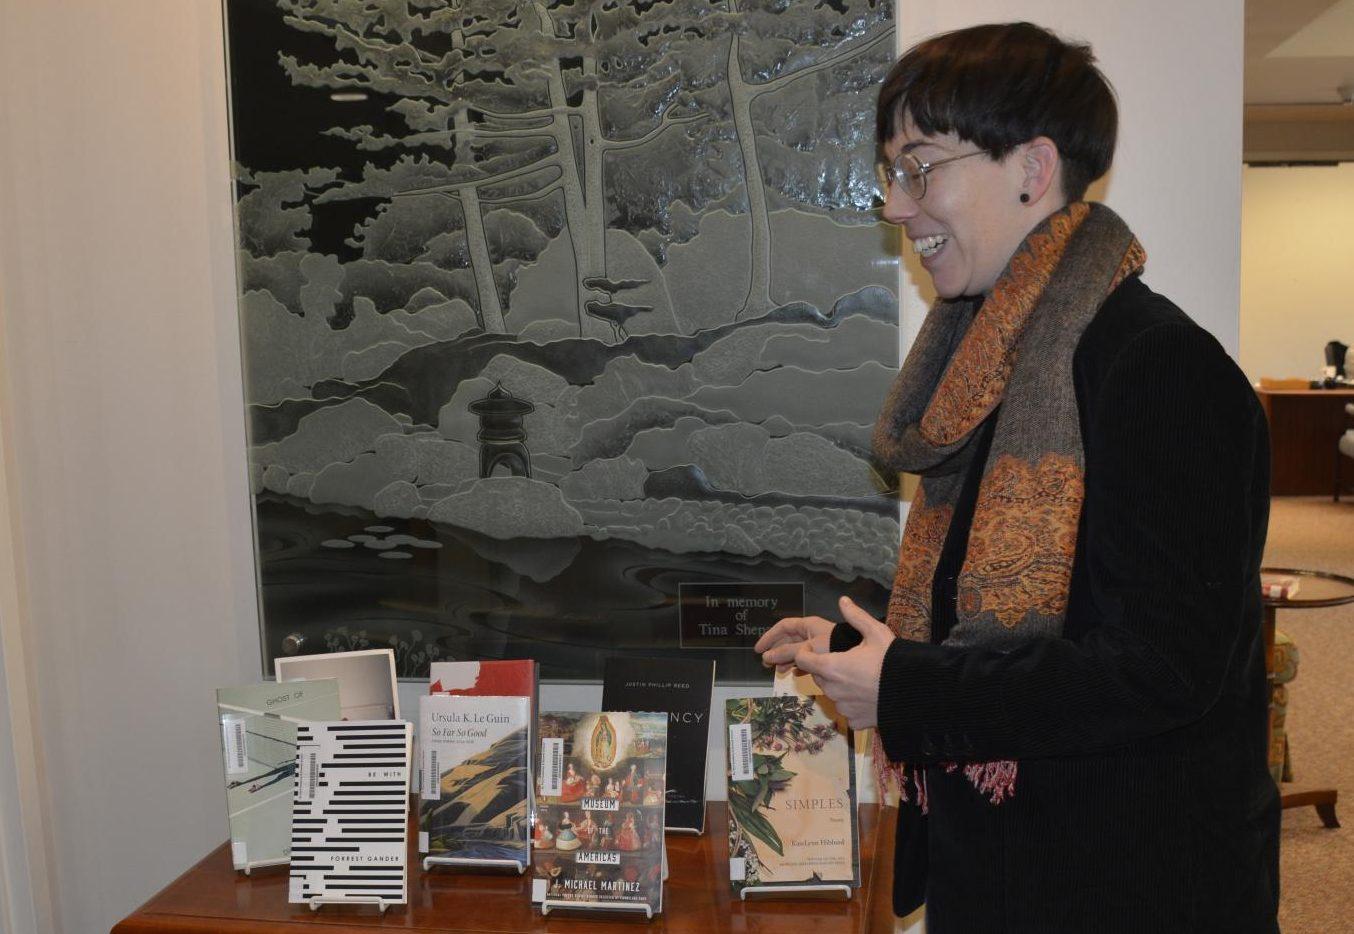 US librarian Kate Brooks sorts through books.